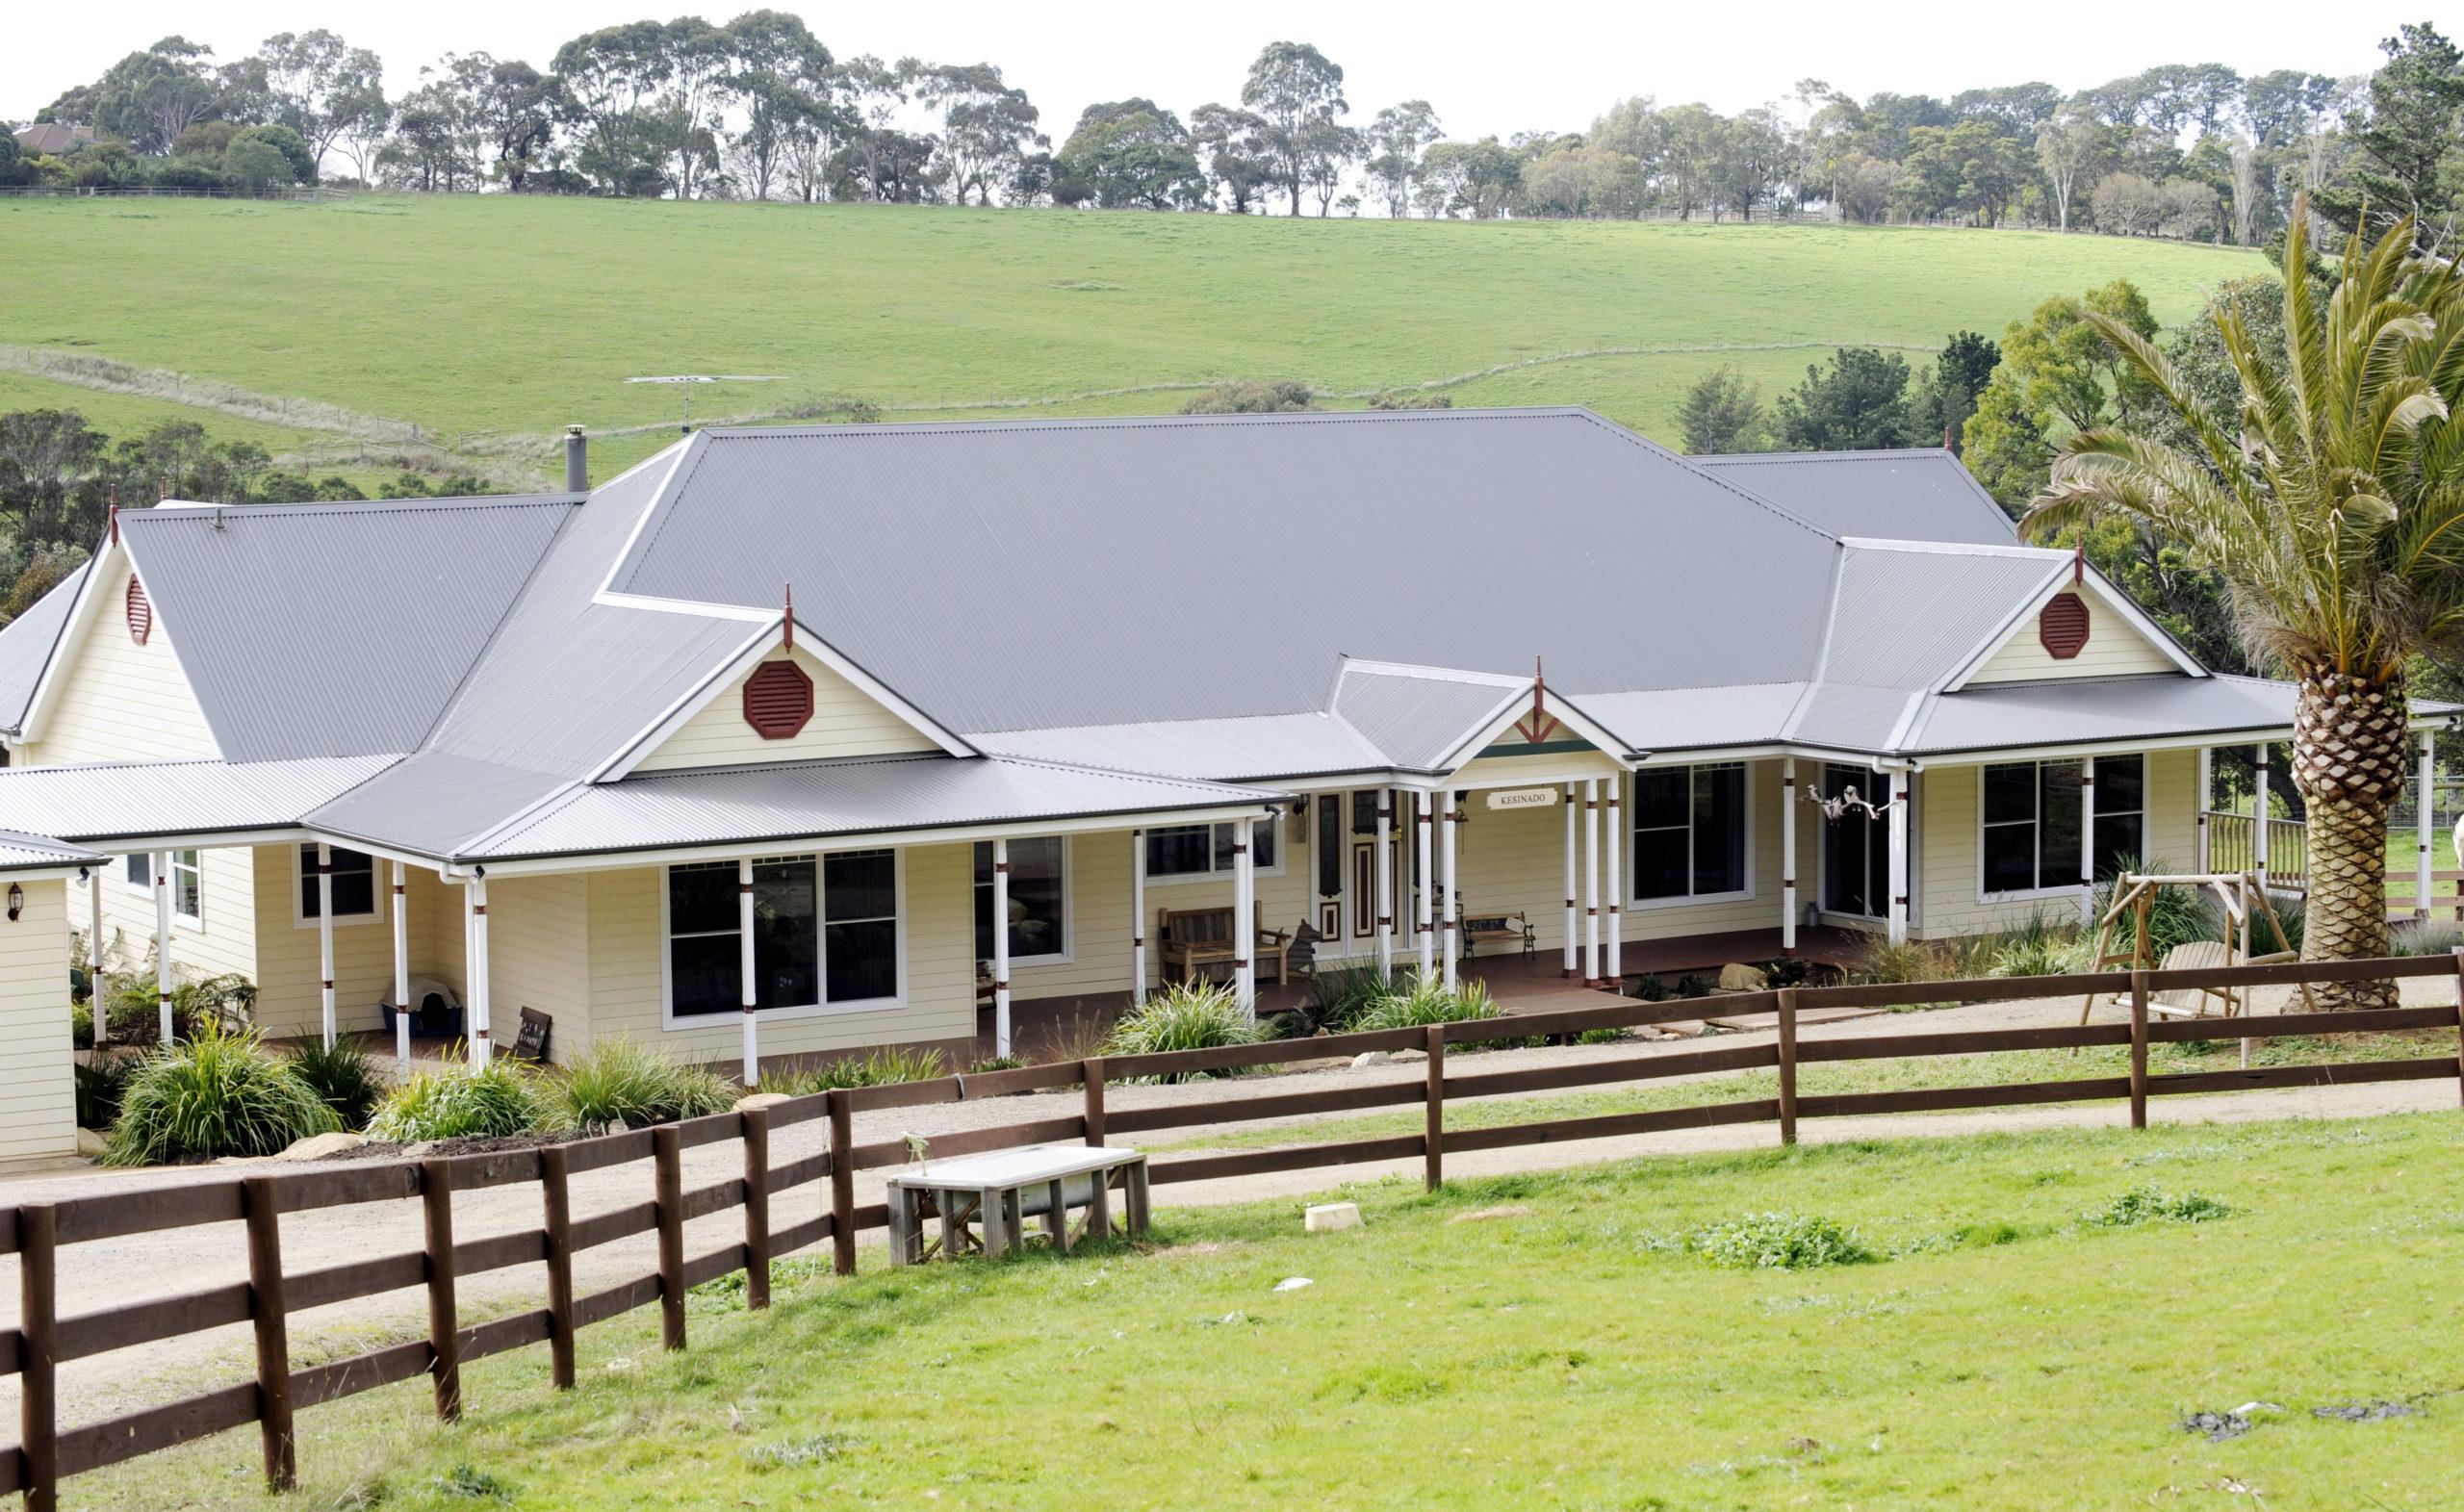 Ferny Hill Merricks - Traditional Custom Design built by Farm Houses of Australia